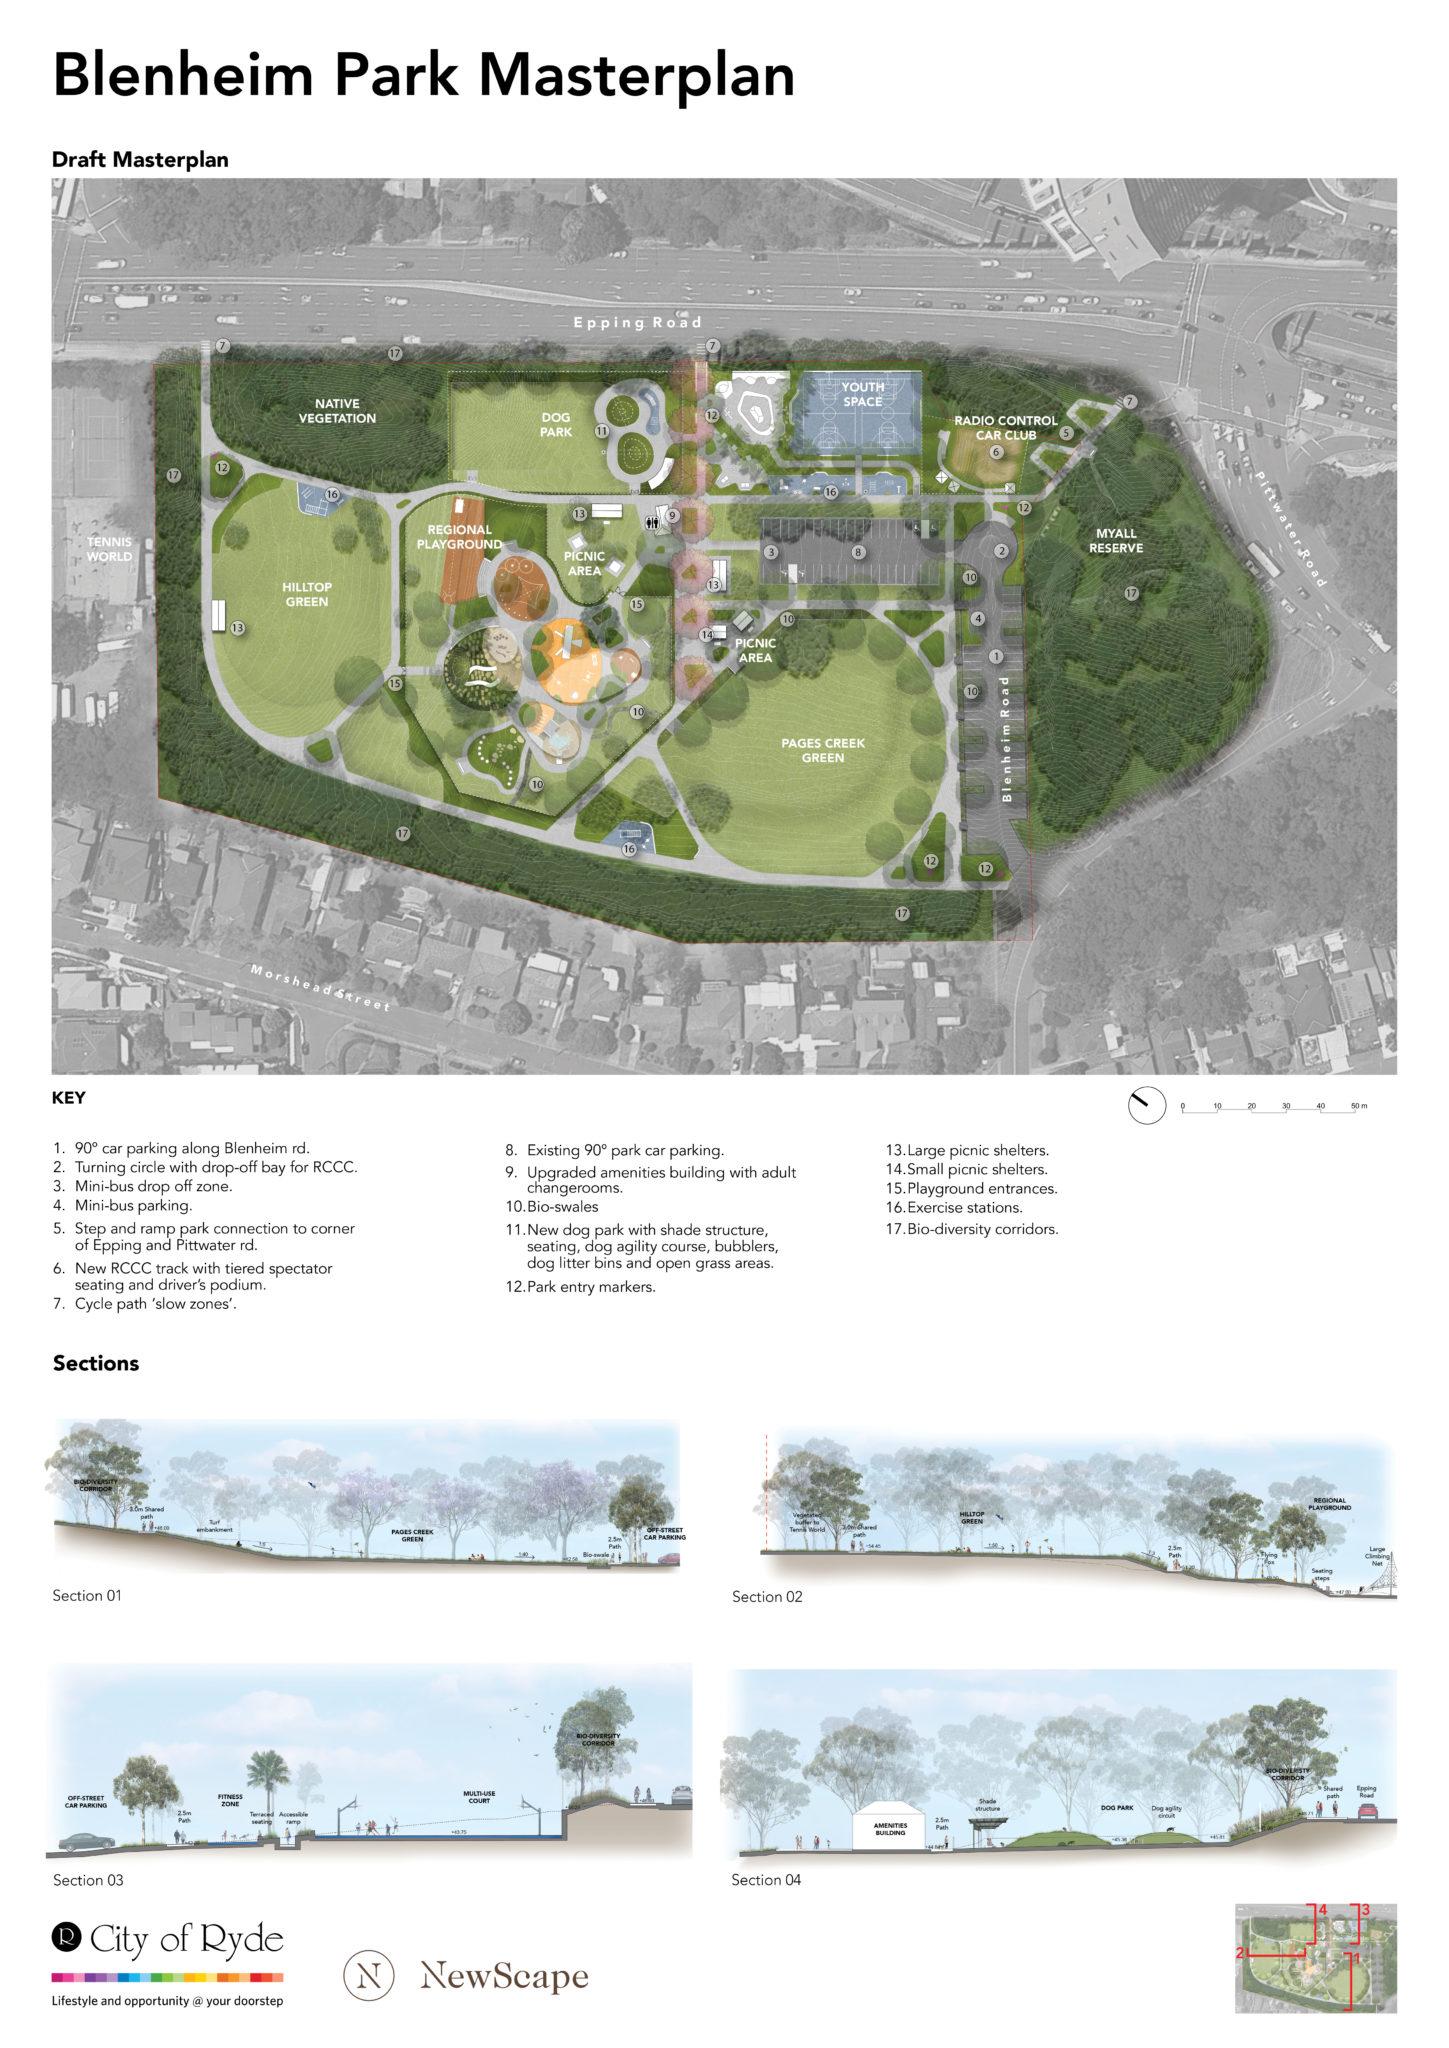 Blenheim Park Masterplan